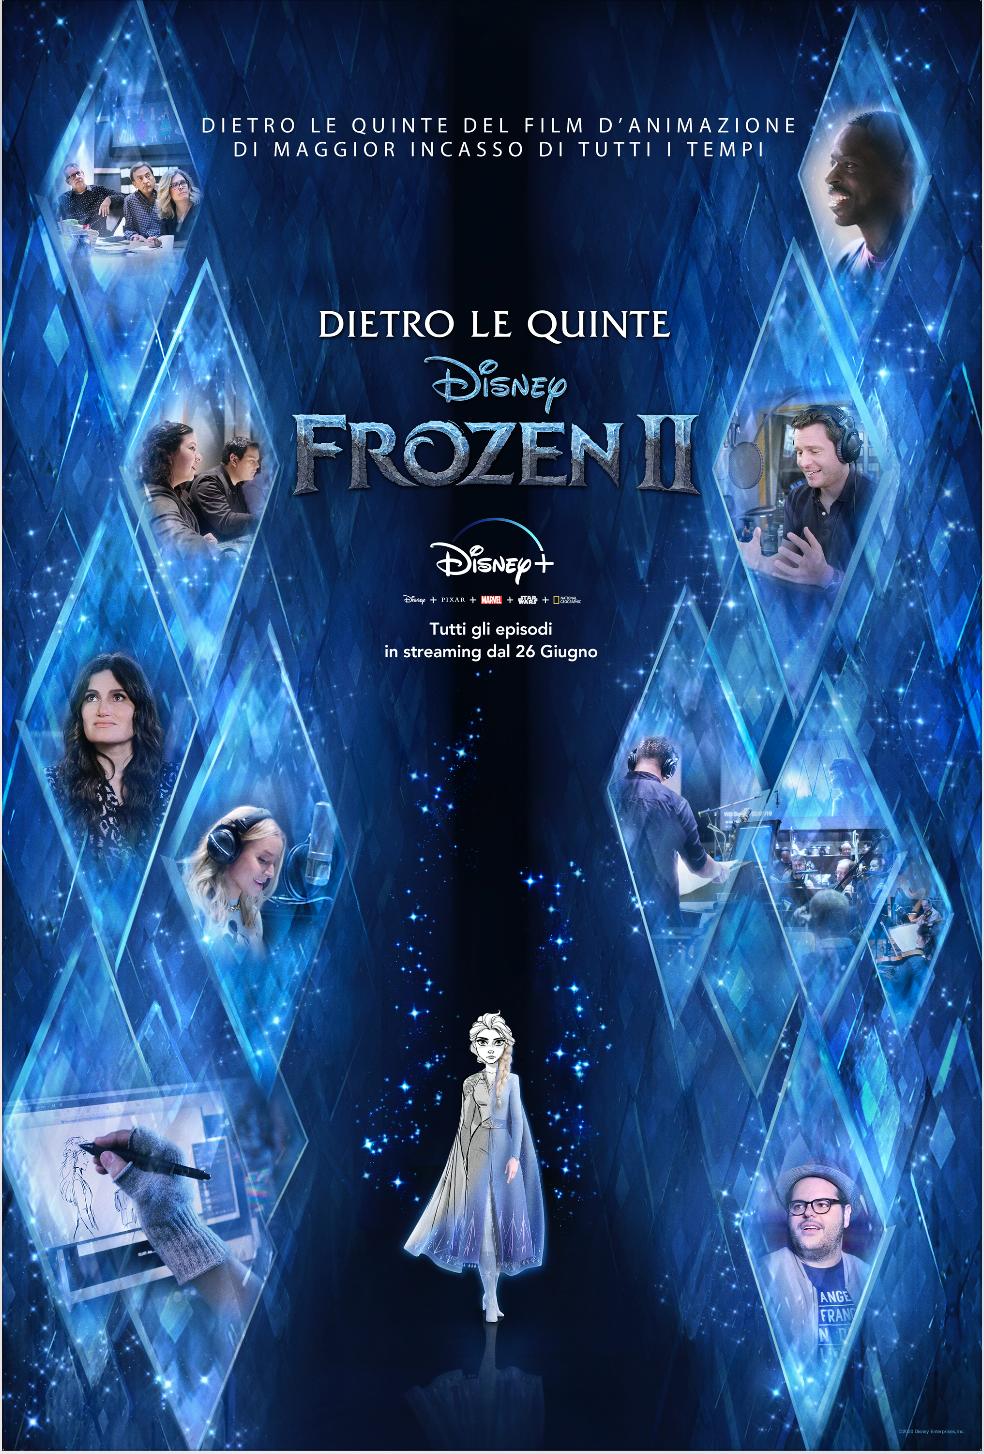 Frozen II: Dietro le Quinte